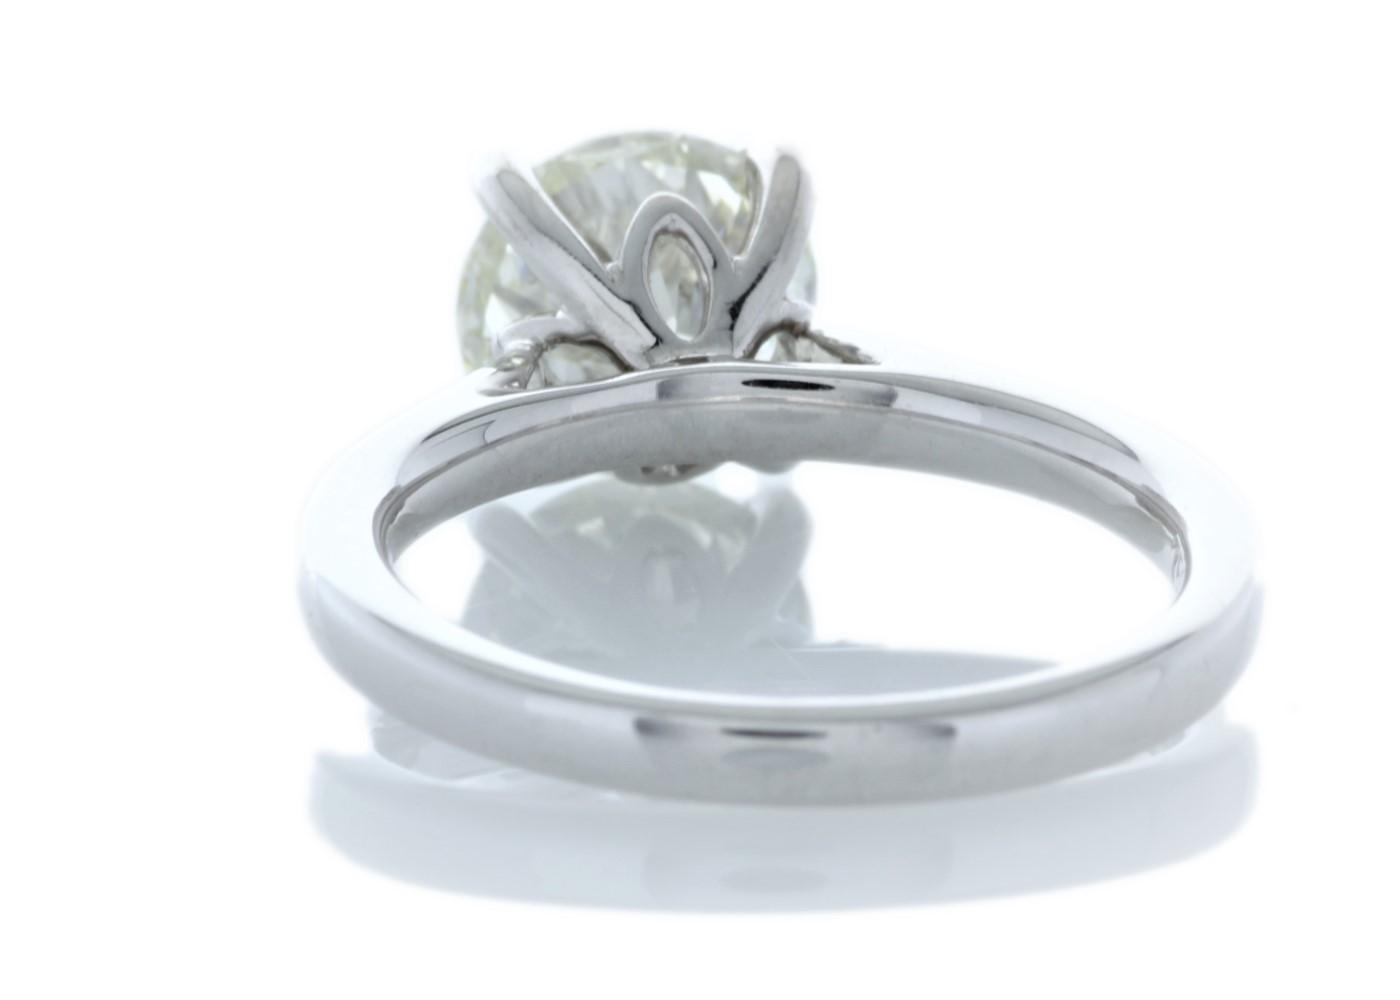 18ct White Gold Single Stone Claw Set Diamond Ring 2.05 Carats - Image 4 of 5